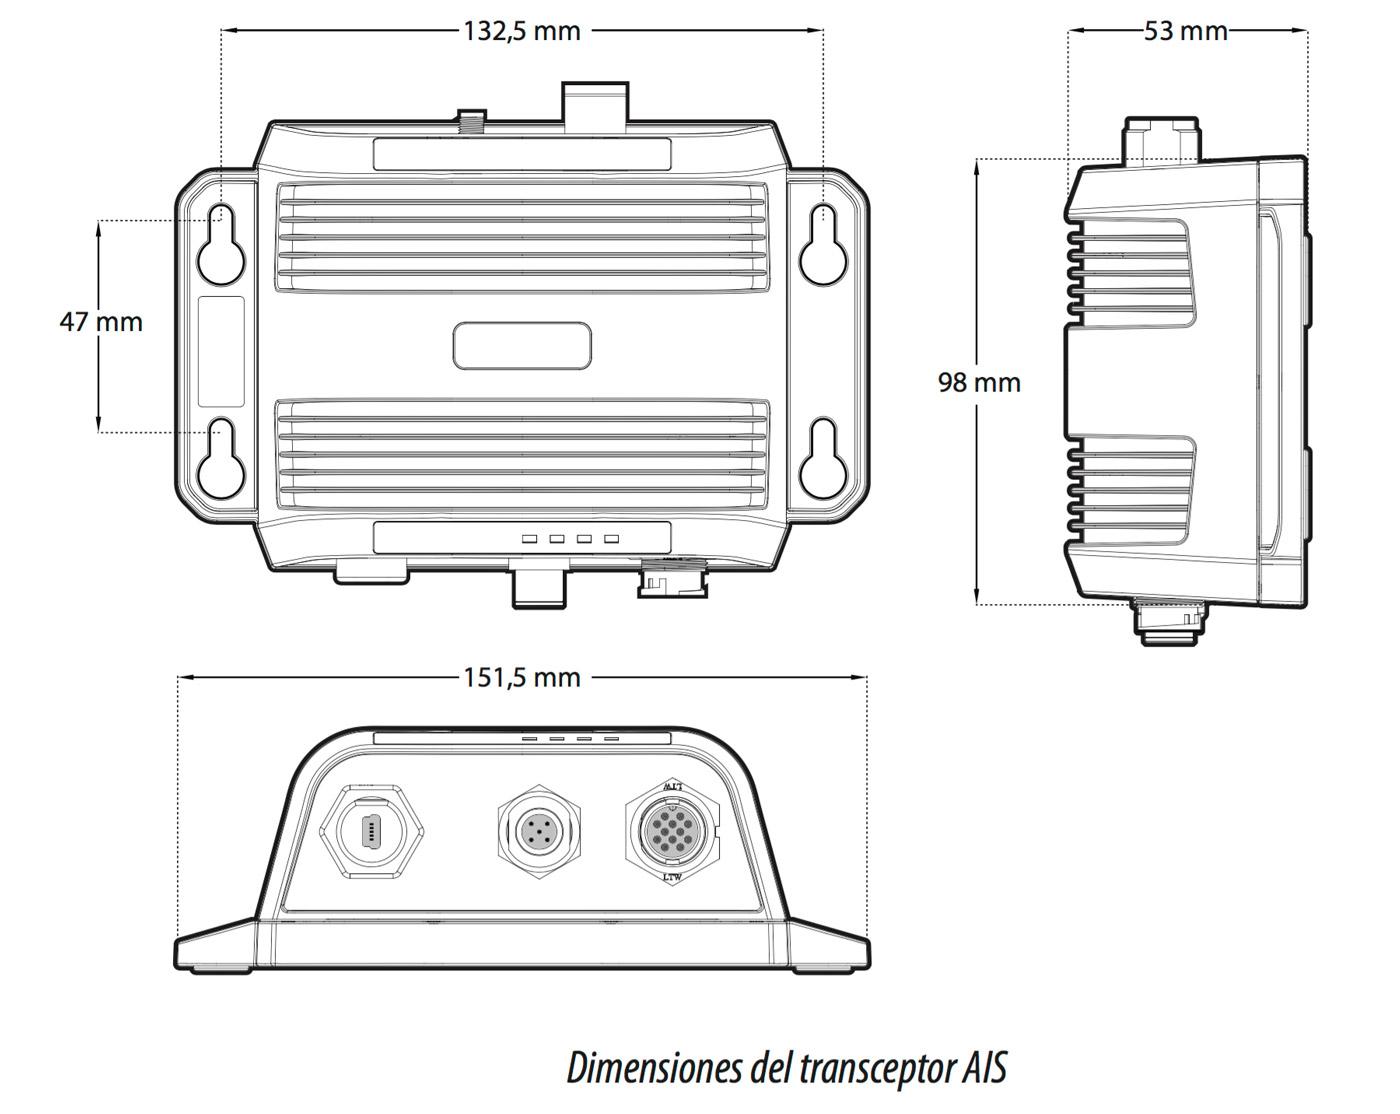 Dimensiones transpondedor